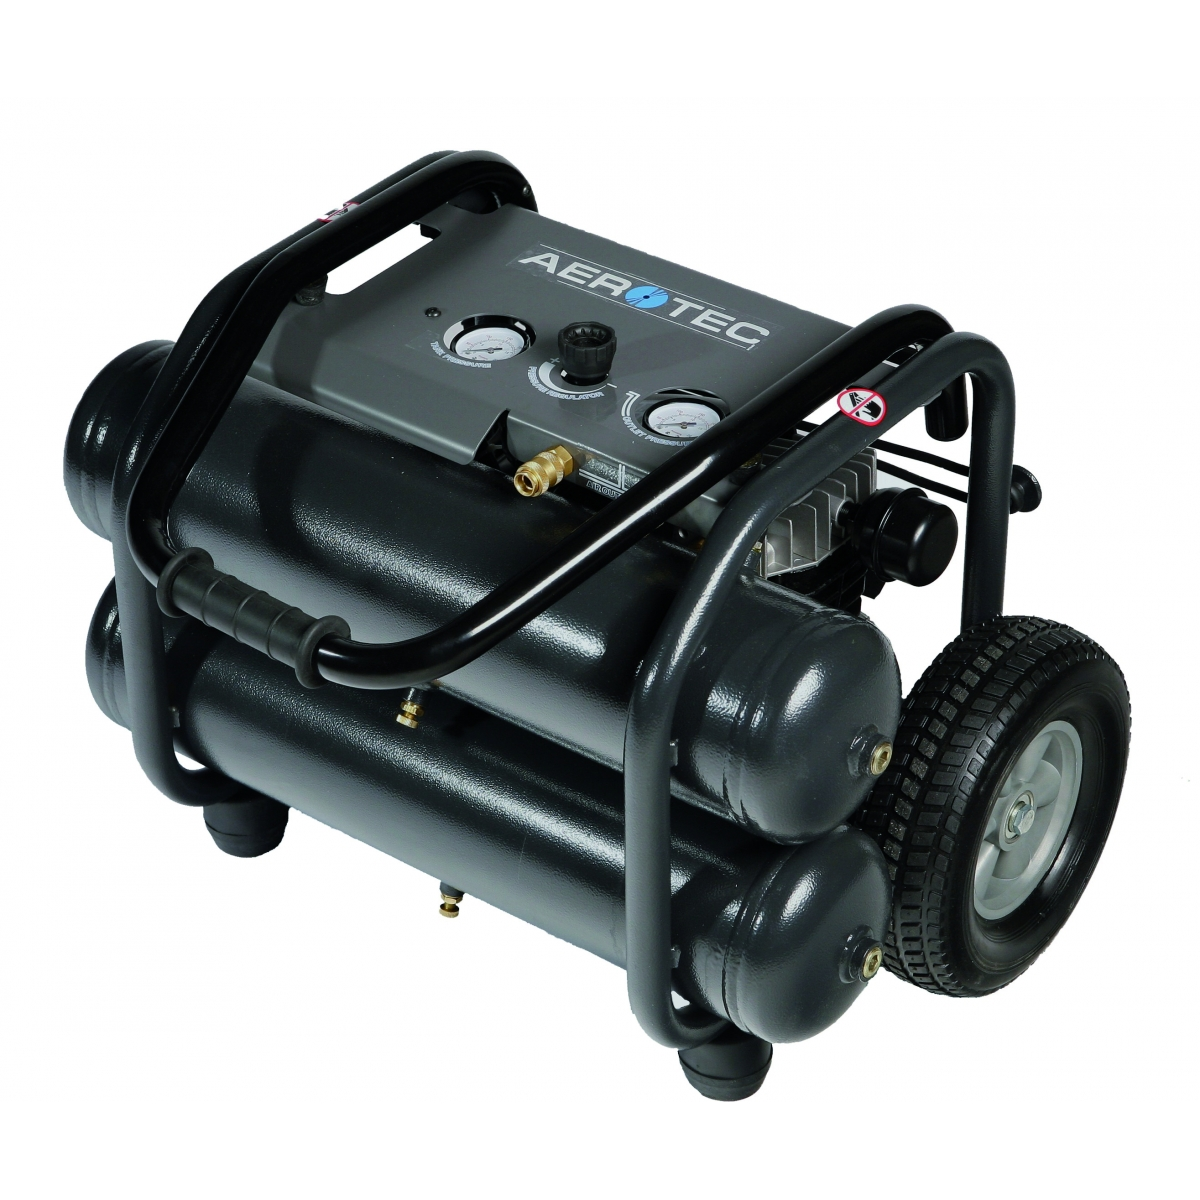 aerotec druckluft kompressor kolbenkompressor fahrbar montage 230 v. Black Bedroom Furniture Sets. Home Design Ideas